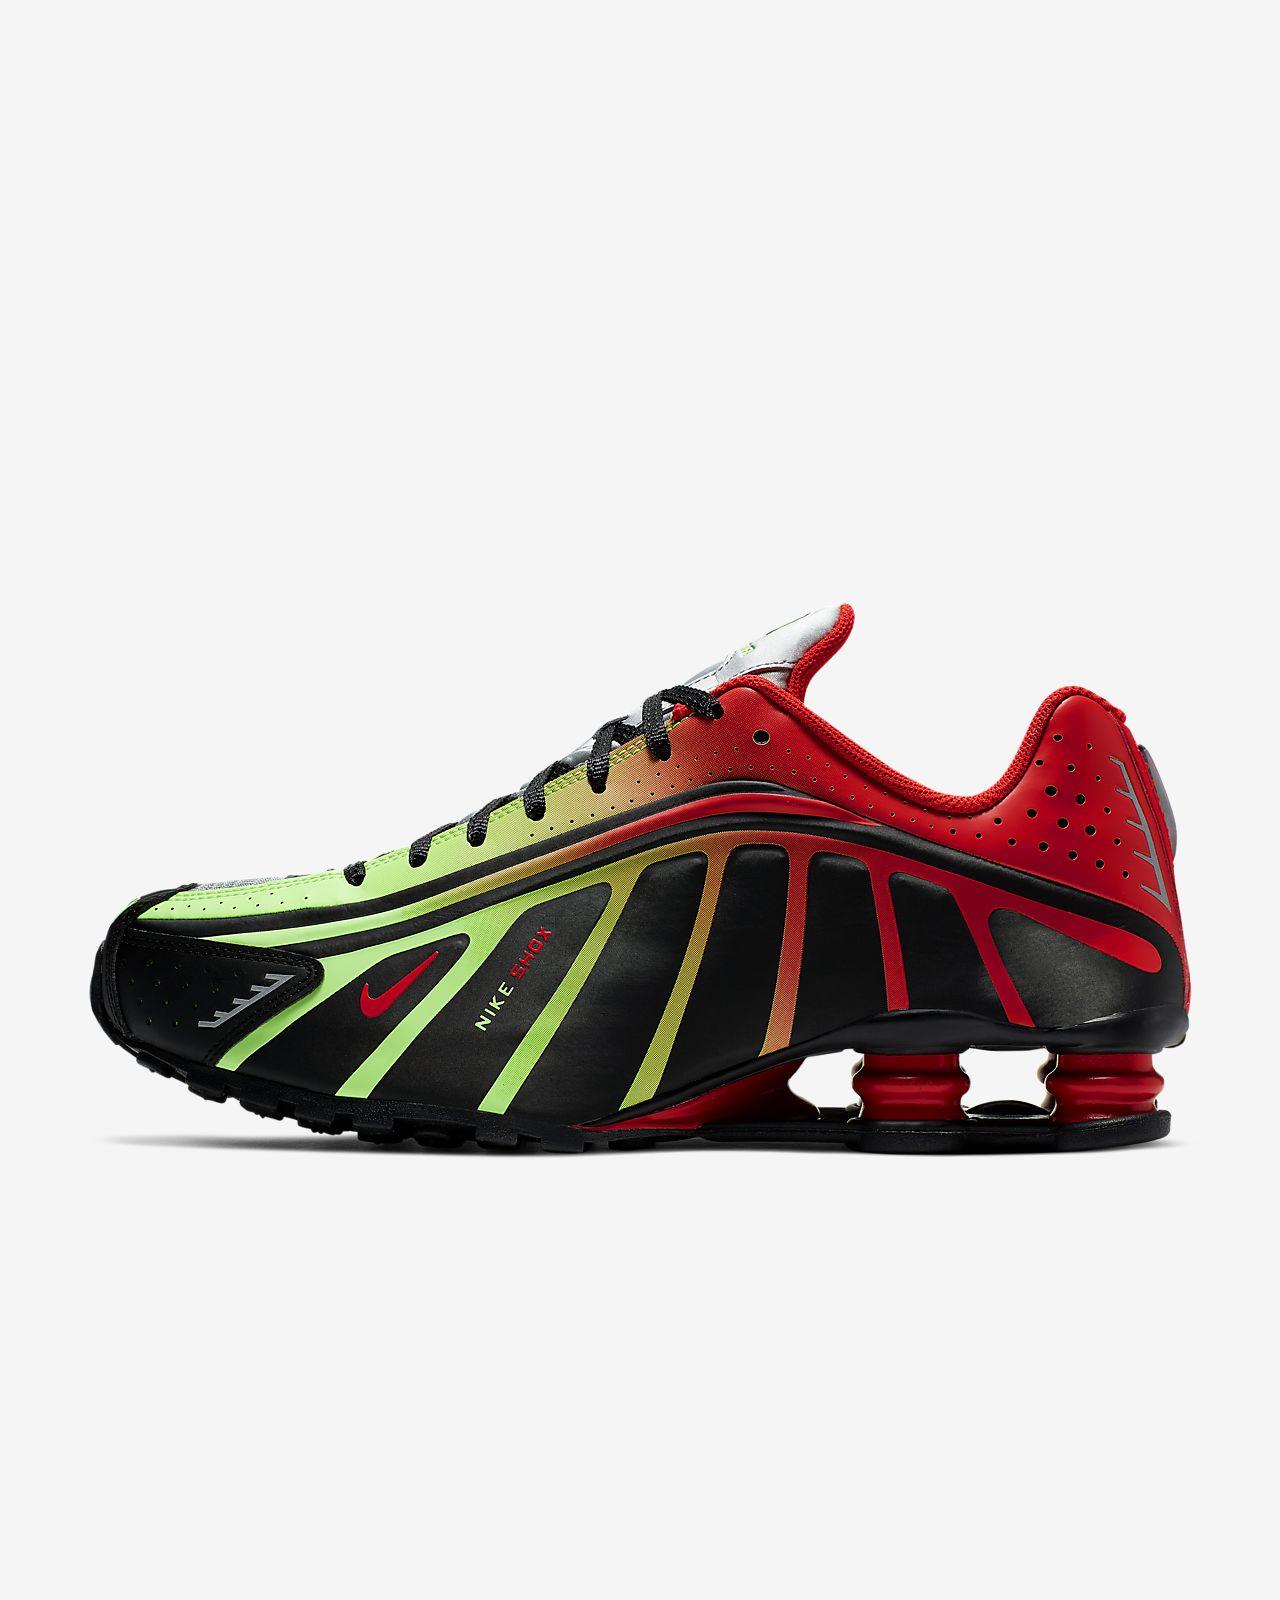 super popular f7ba4 3bd39 ... Sapatilhas Nike Shox R4 Neymar Jr.